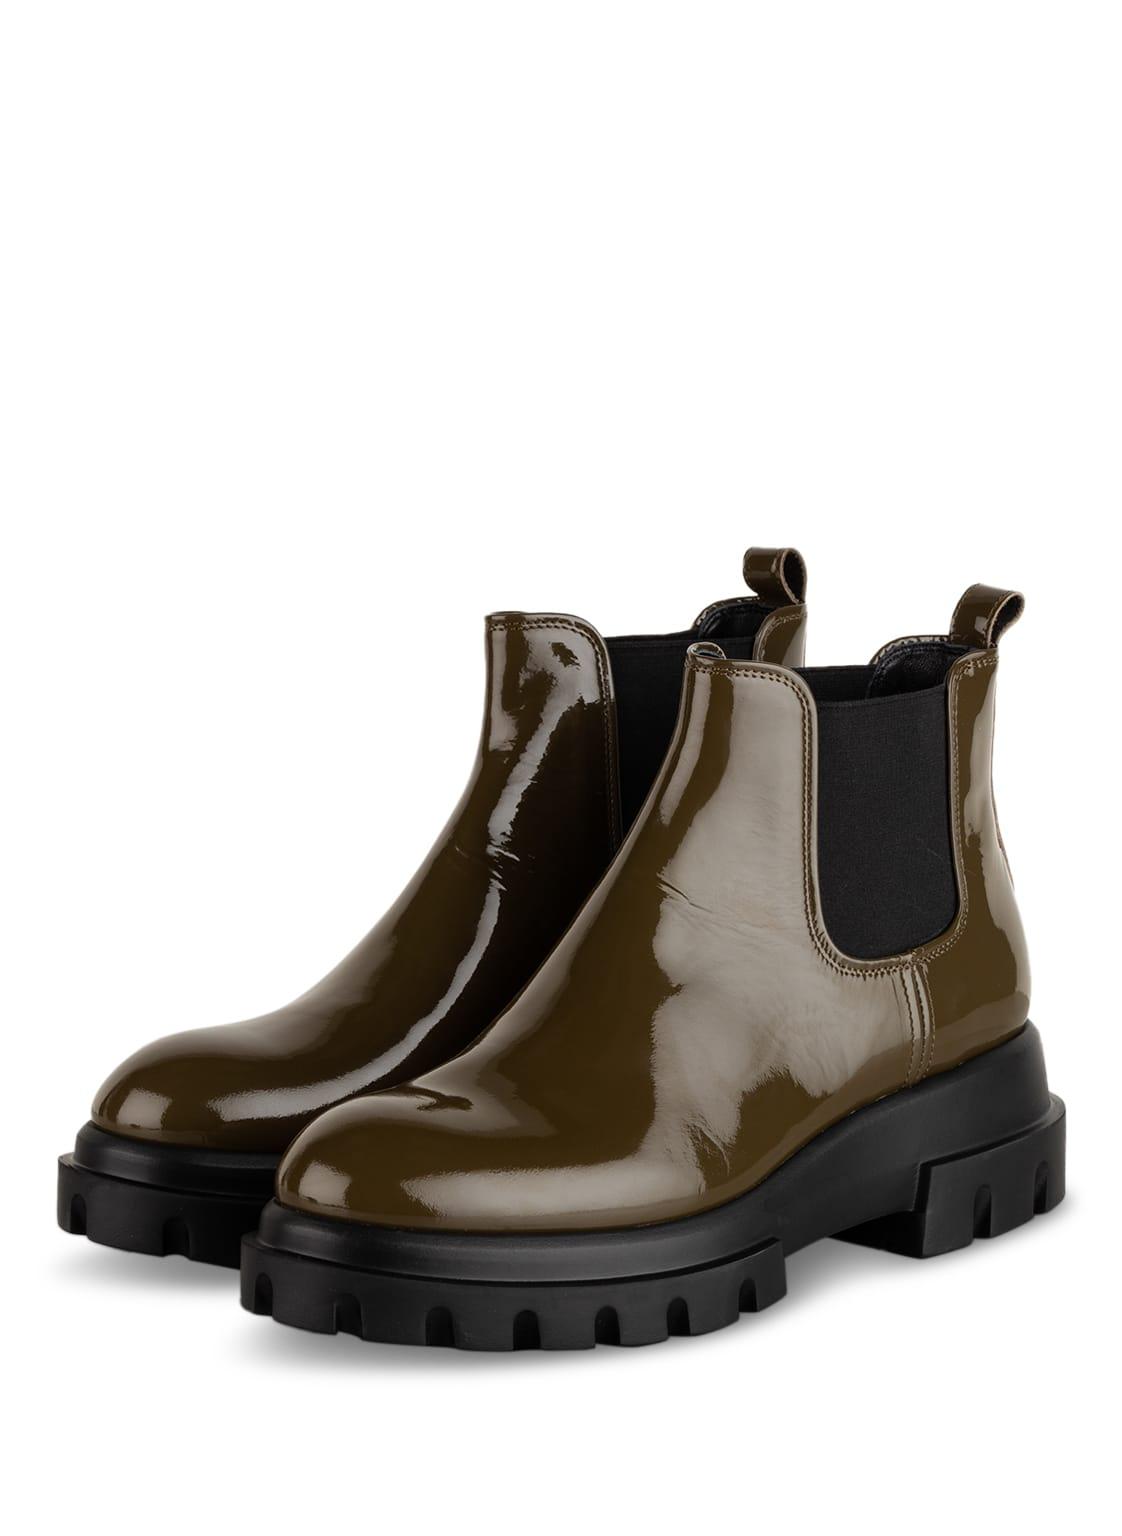 Image of Agl Chelsea-Boots Maxine gruen